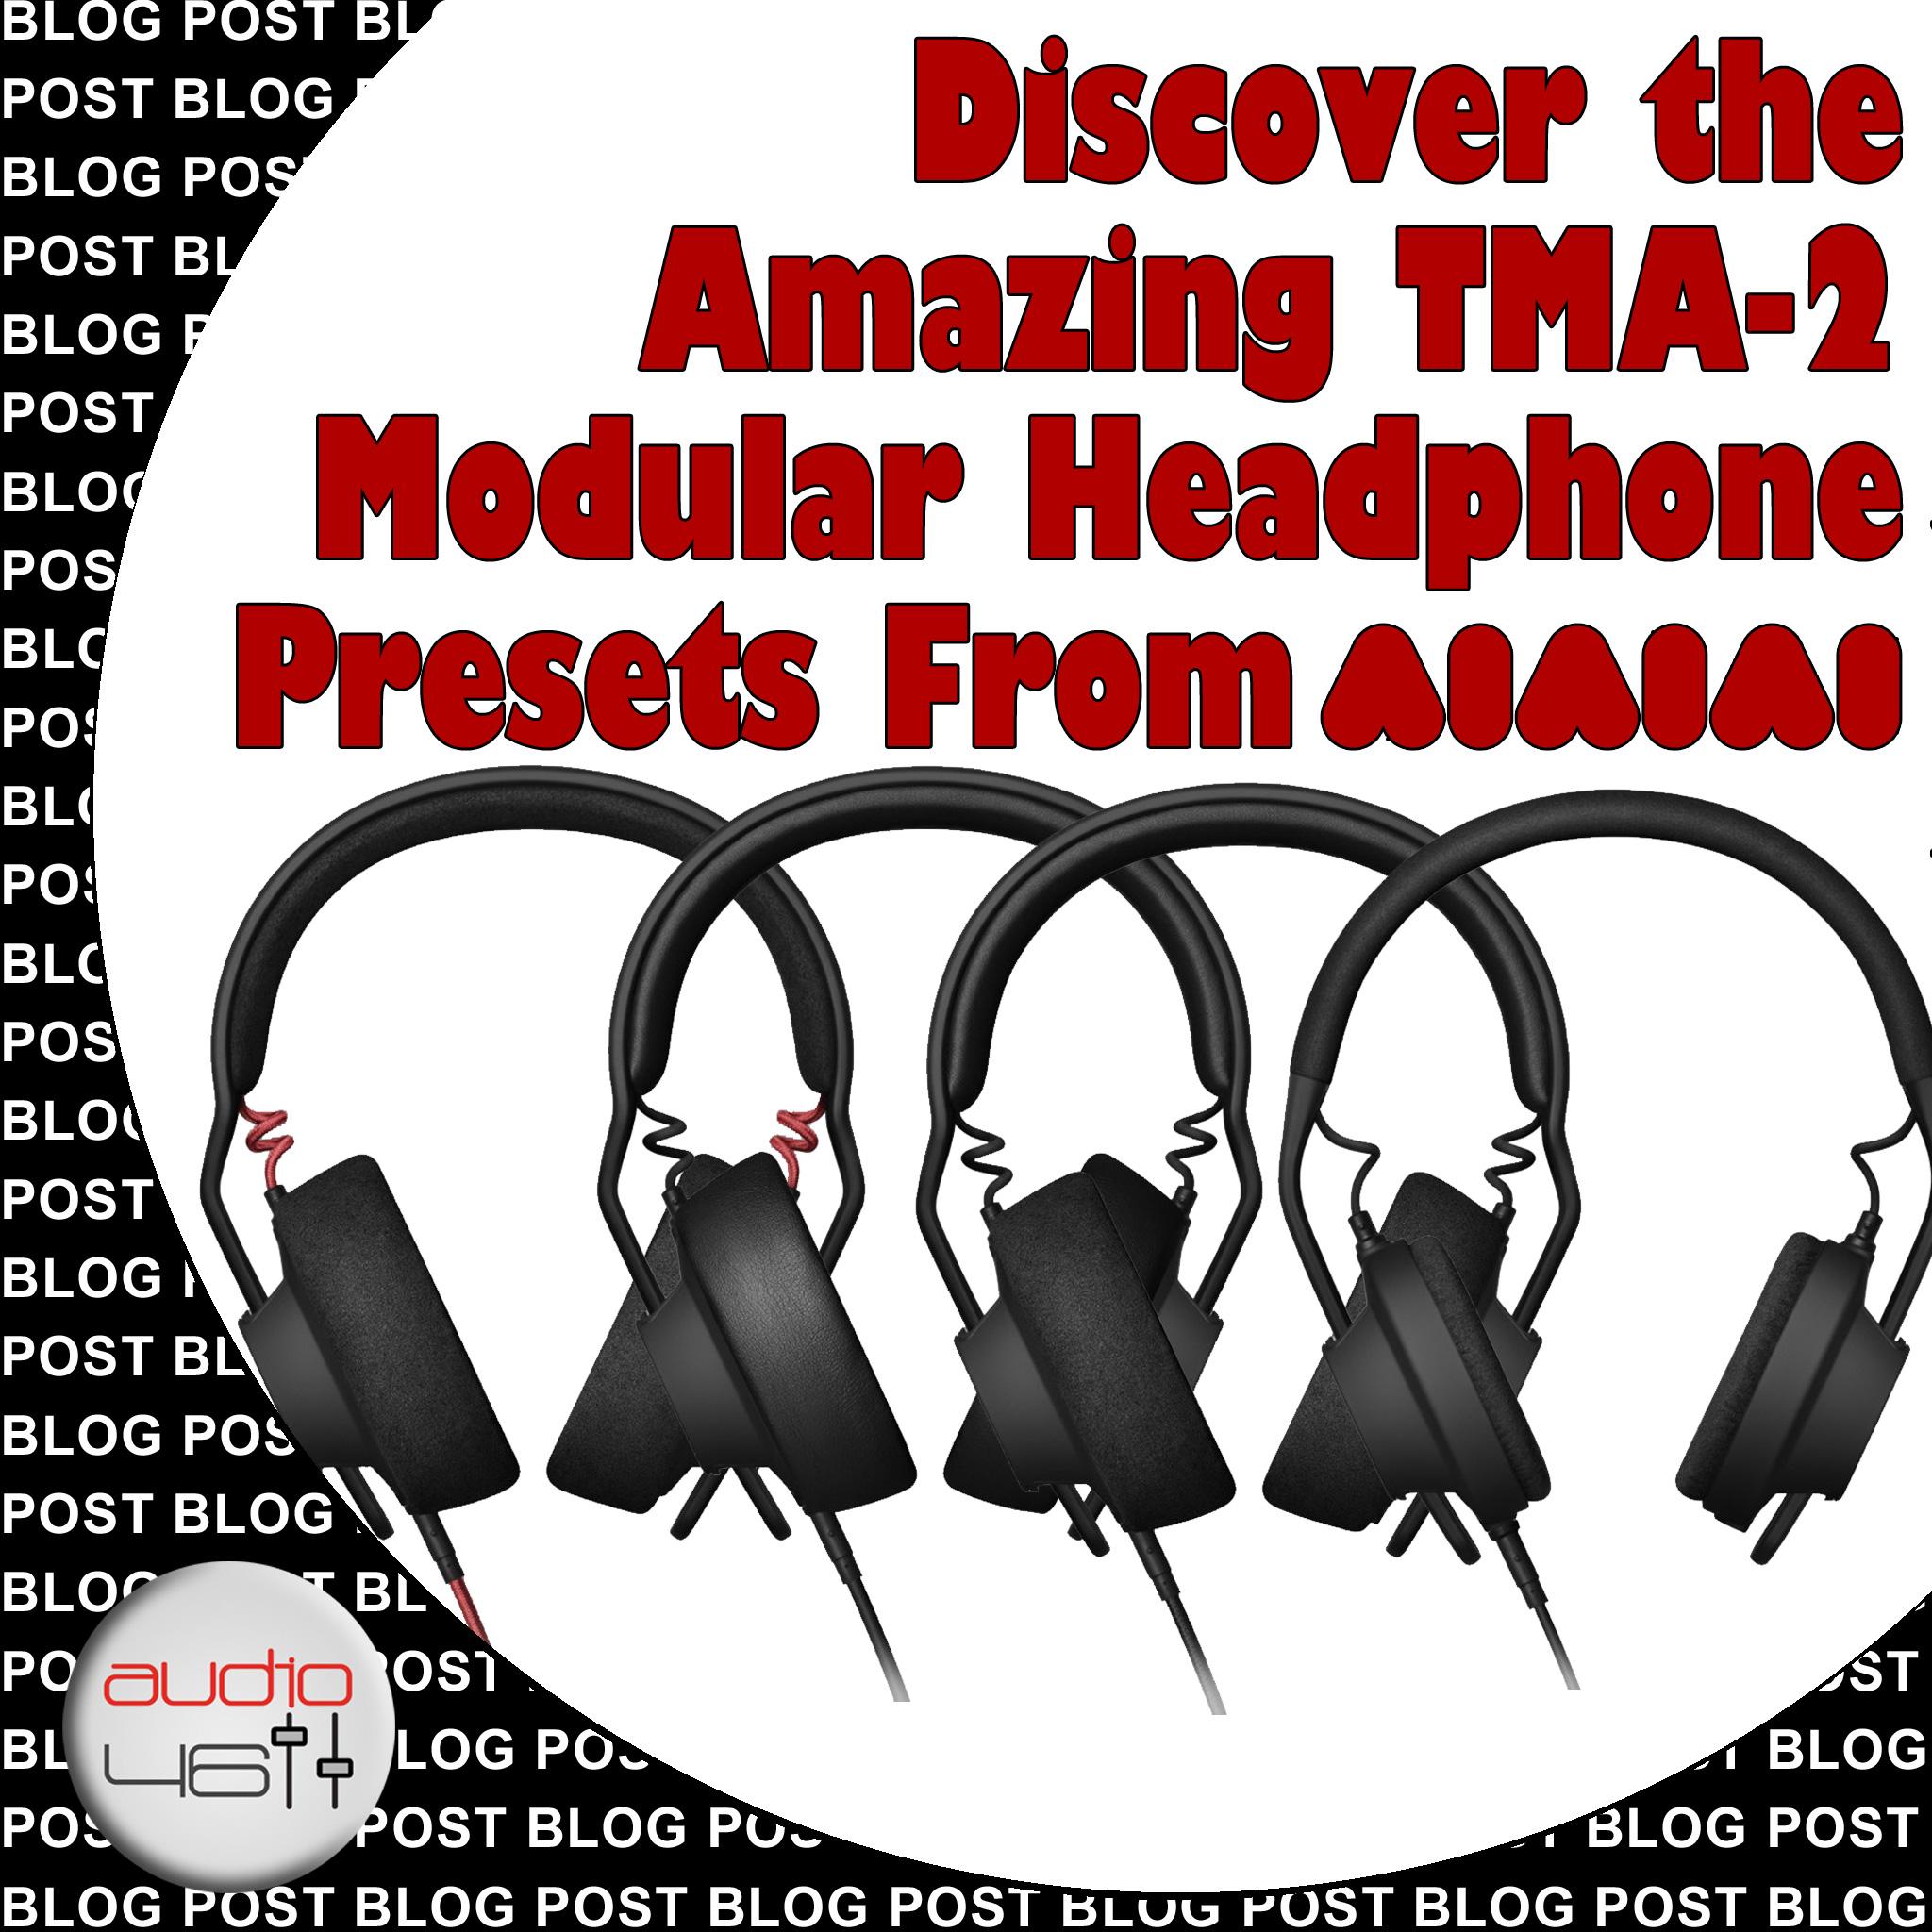 Discover the Amazing TMA-2 Modular Headphone Presets from AIAIAI